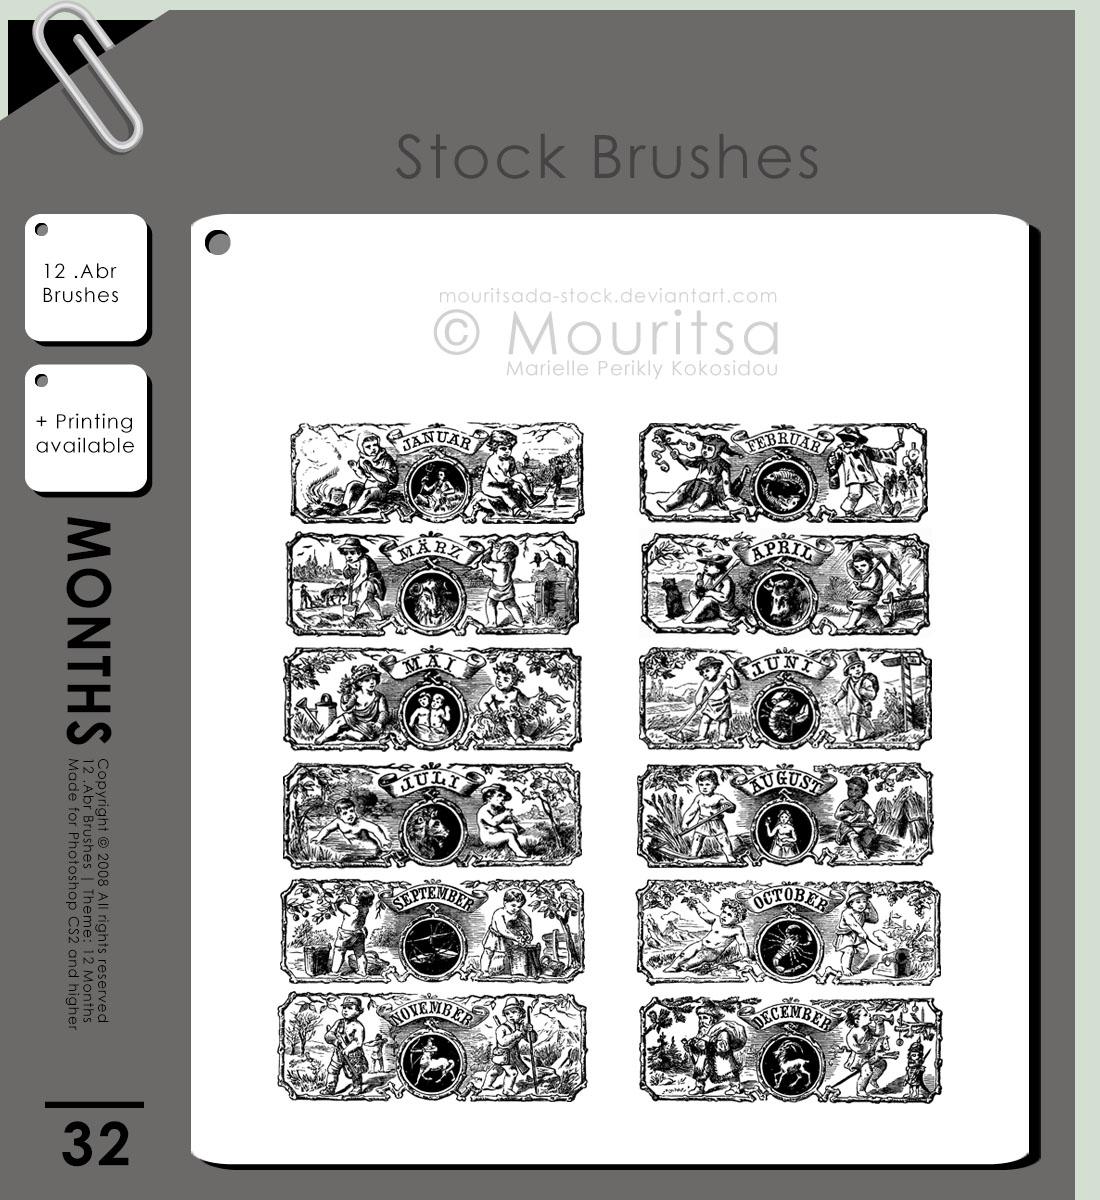 Brush Pack - 12 Months